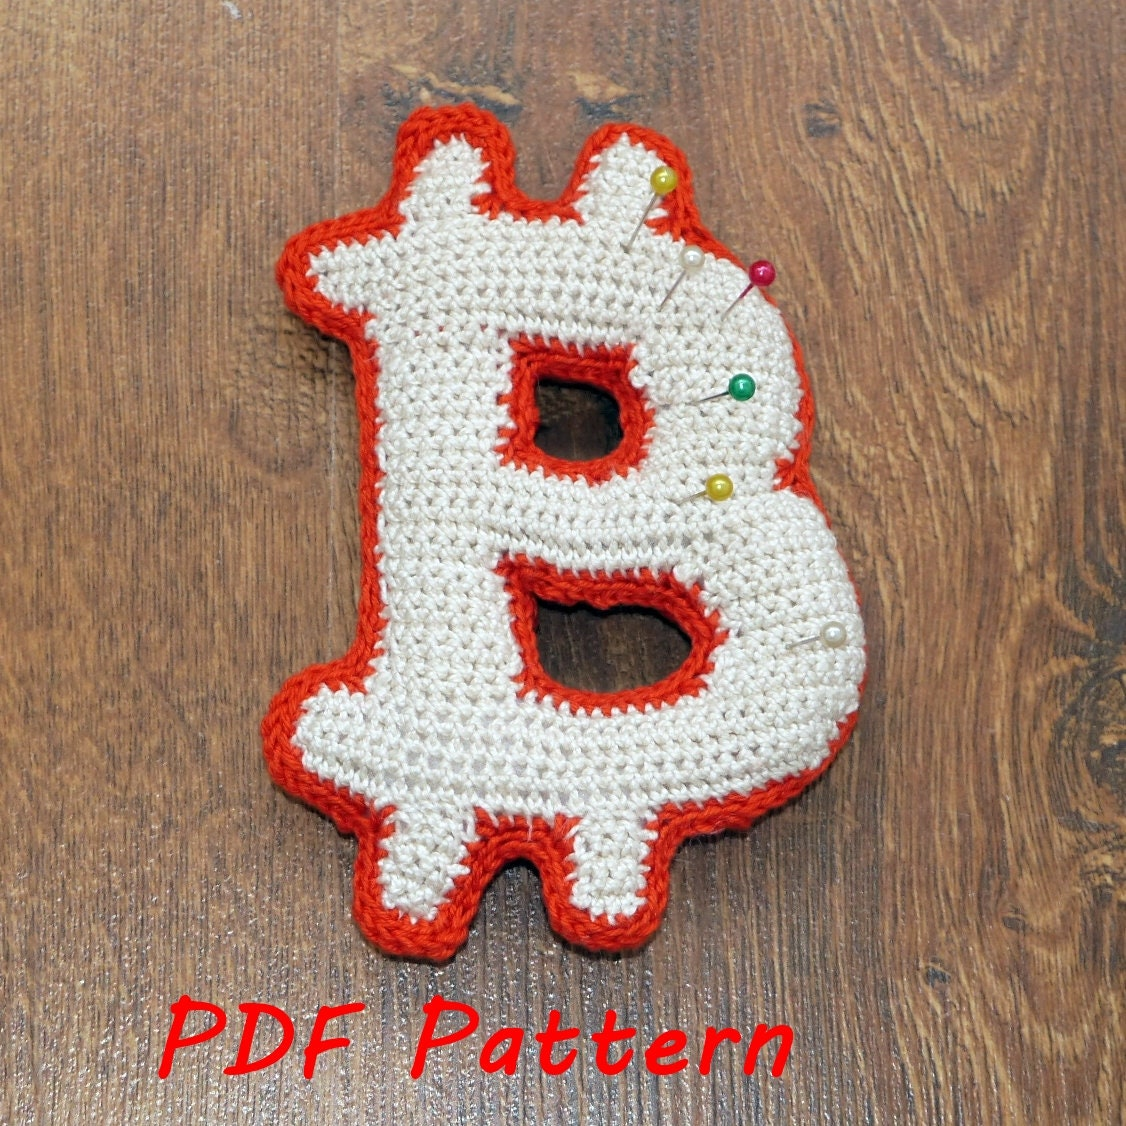 On Sale Crochet Pincushion Pattern Almost Free Crochet Etsy